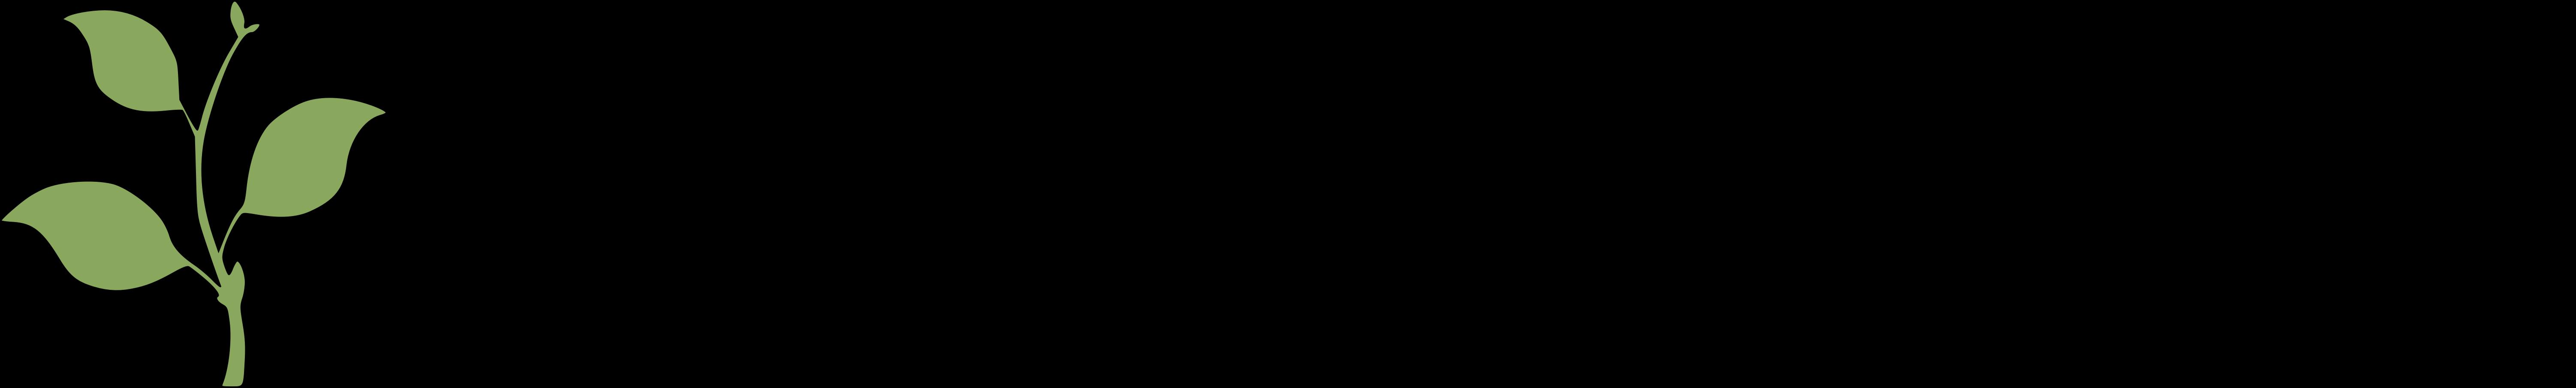 Sapling Energy logo